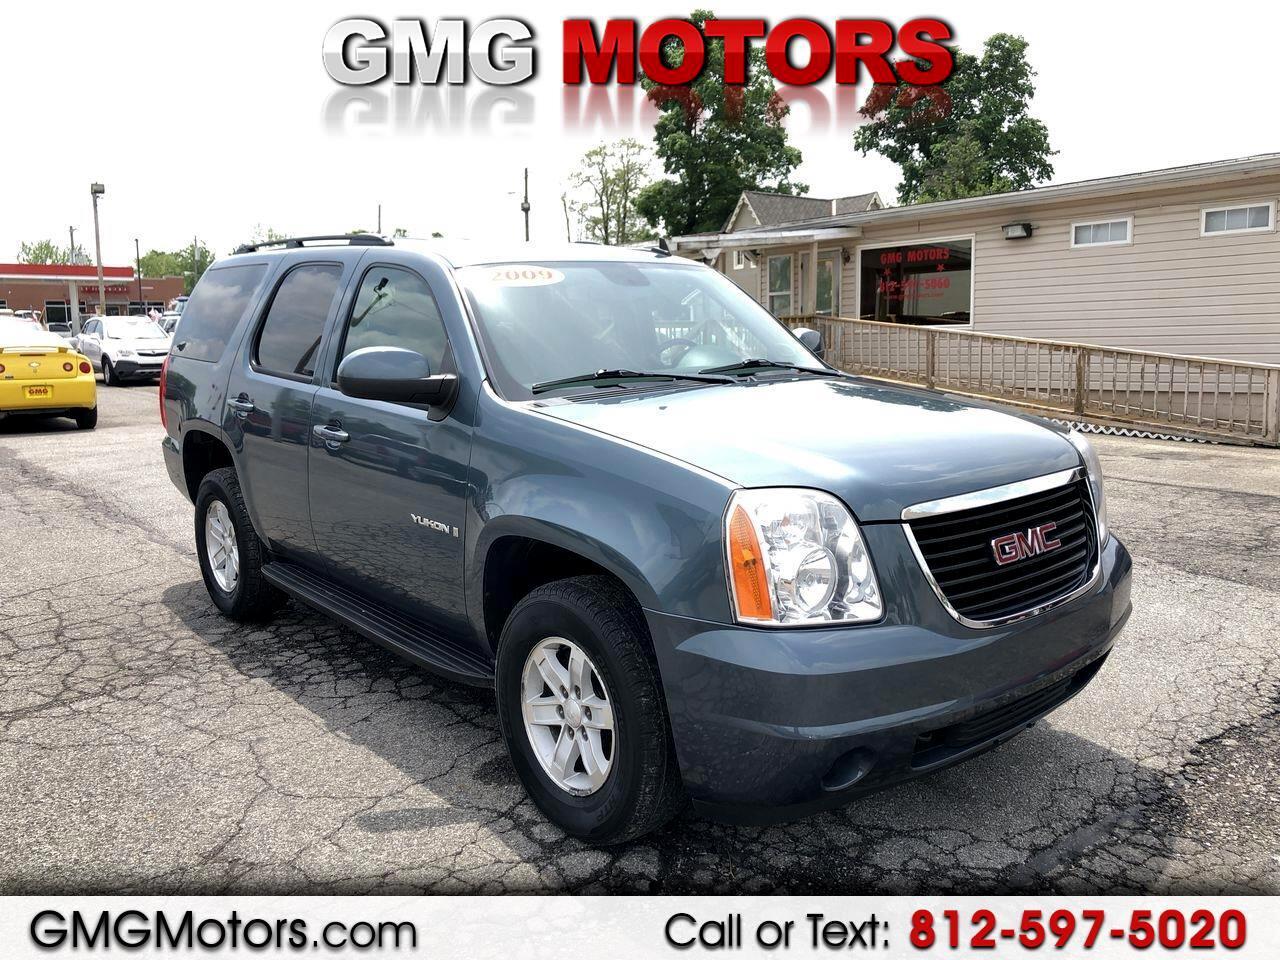 2009 GMC Yukon 4WD 4dr 1500 SLE w/3SA